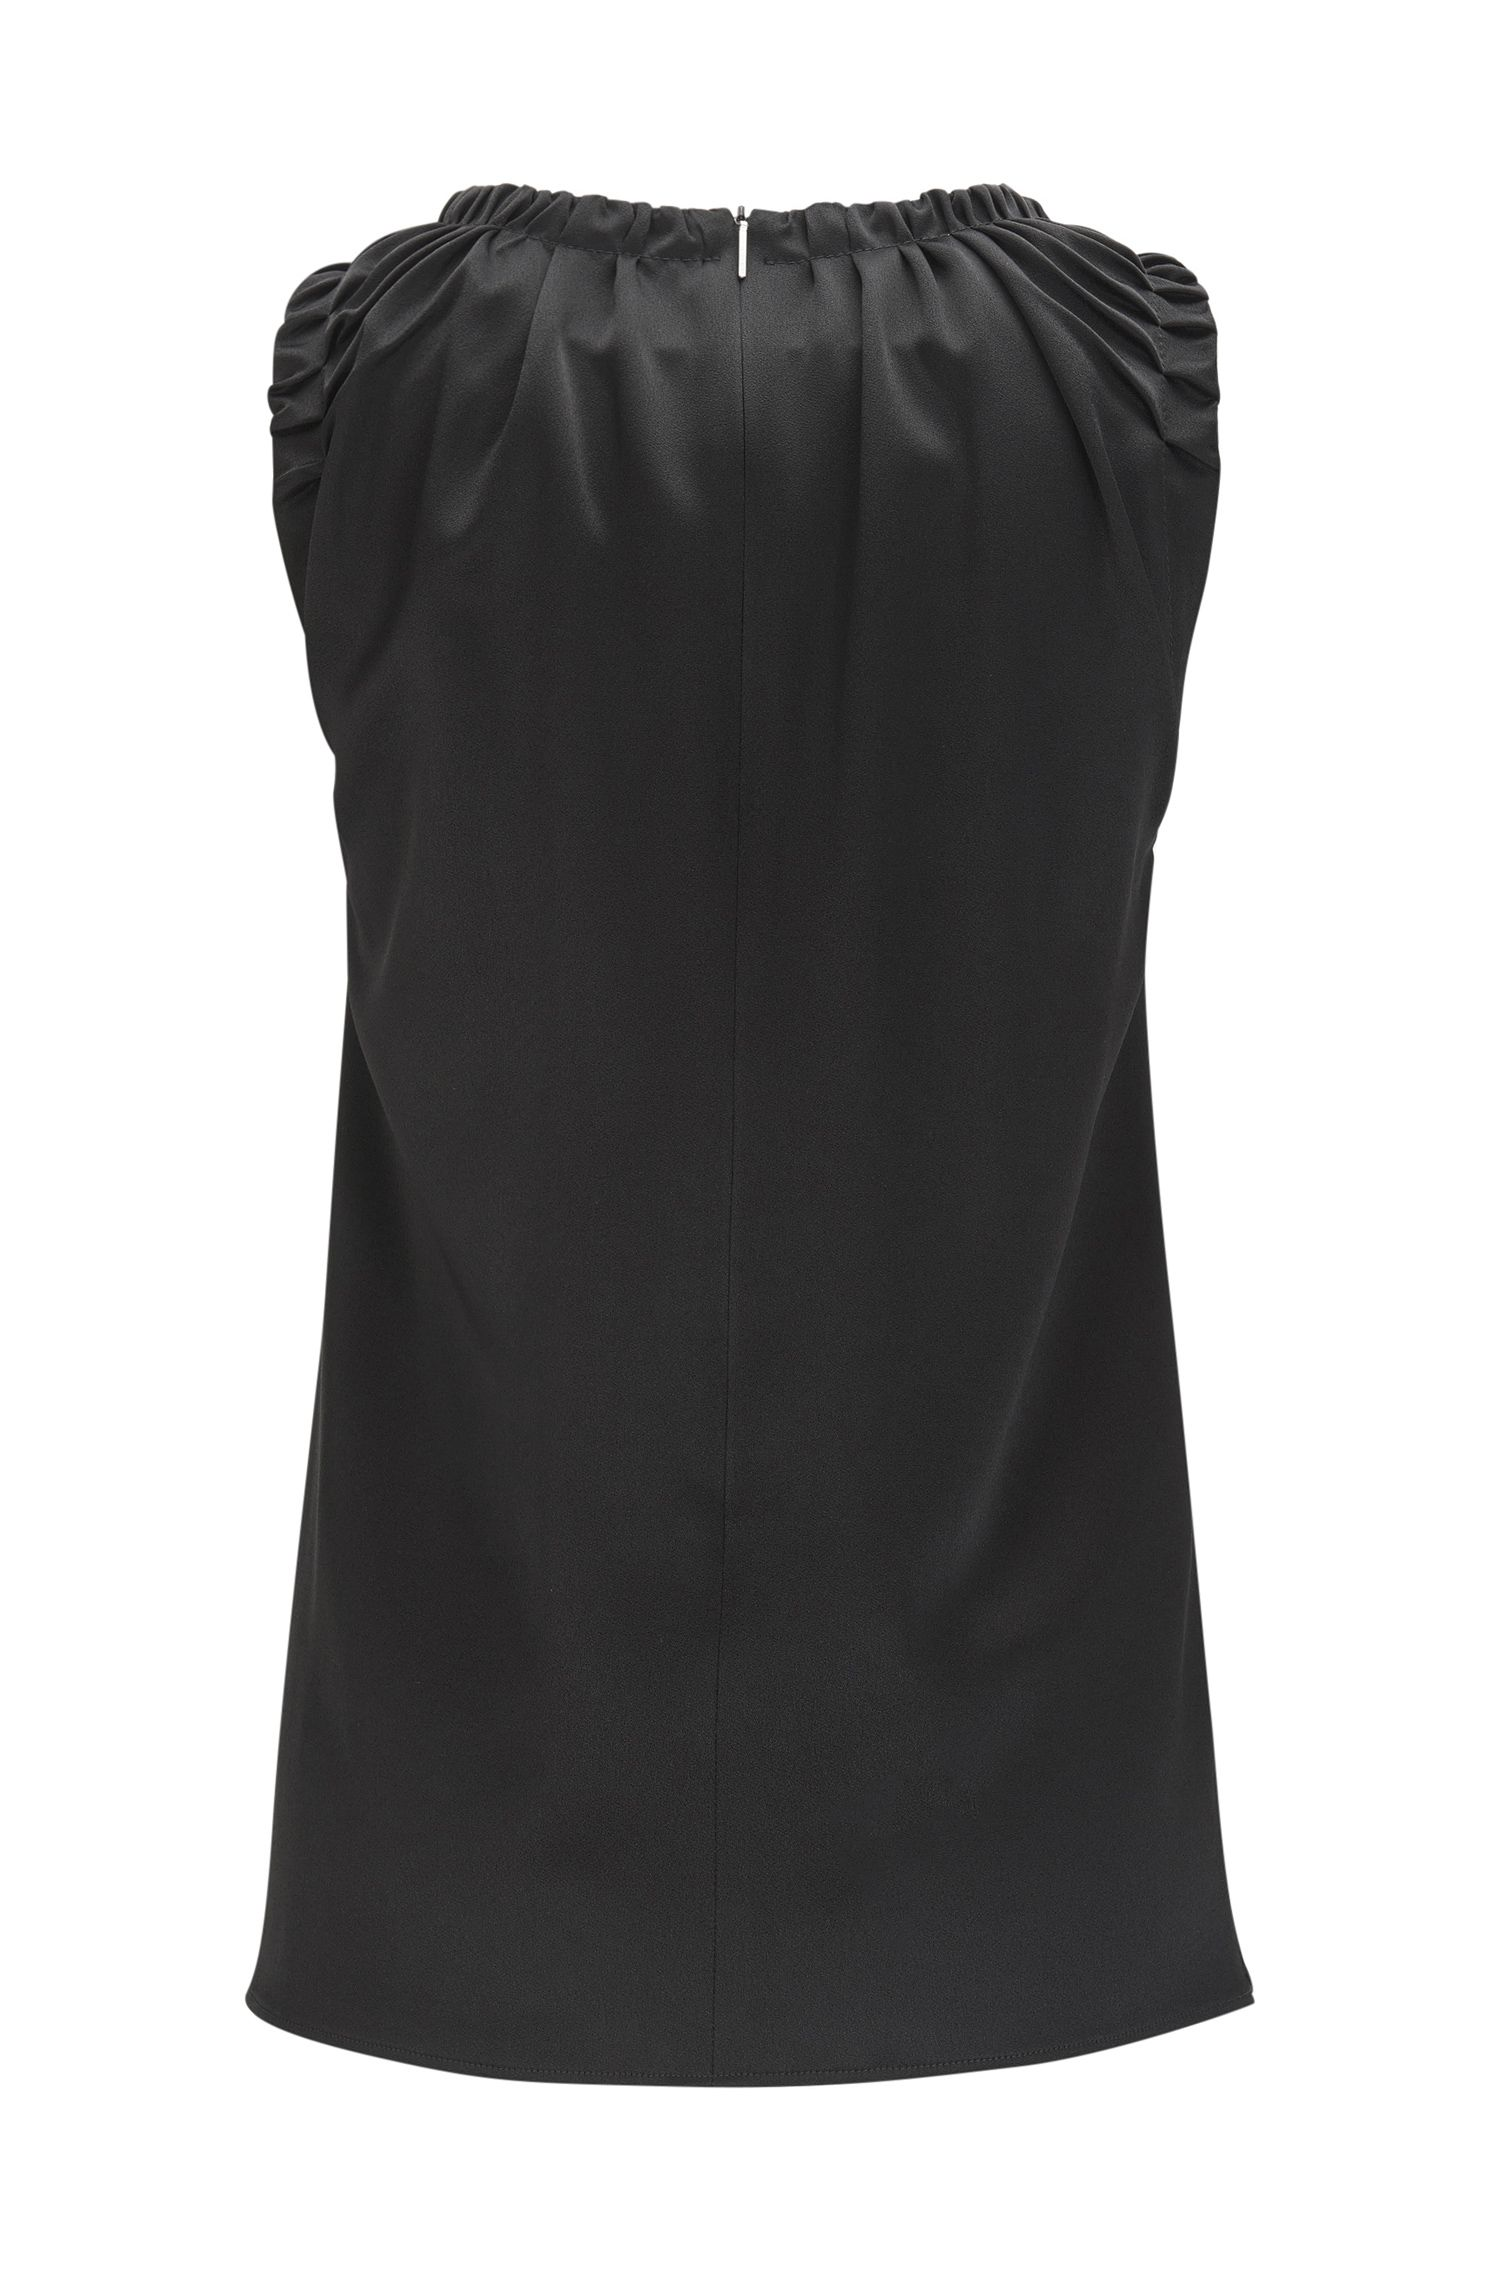 Ruffled Top | Ivancia, Black